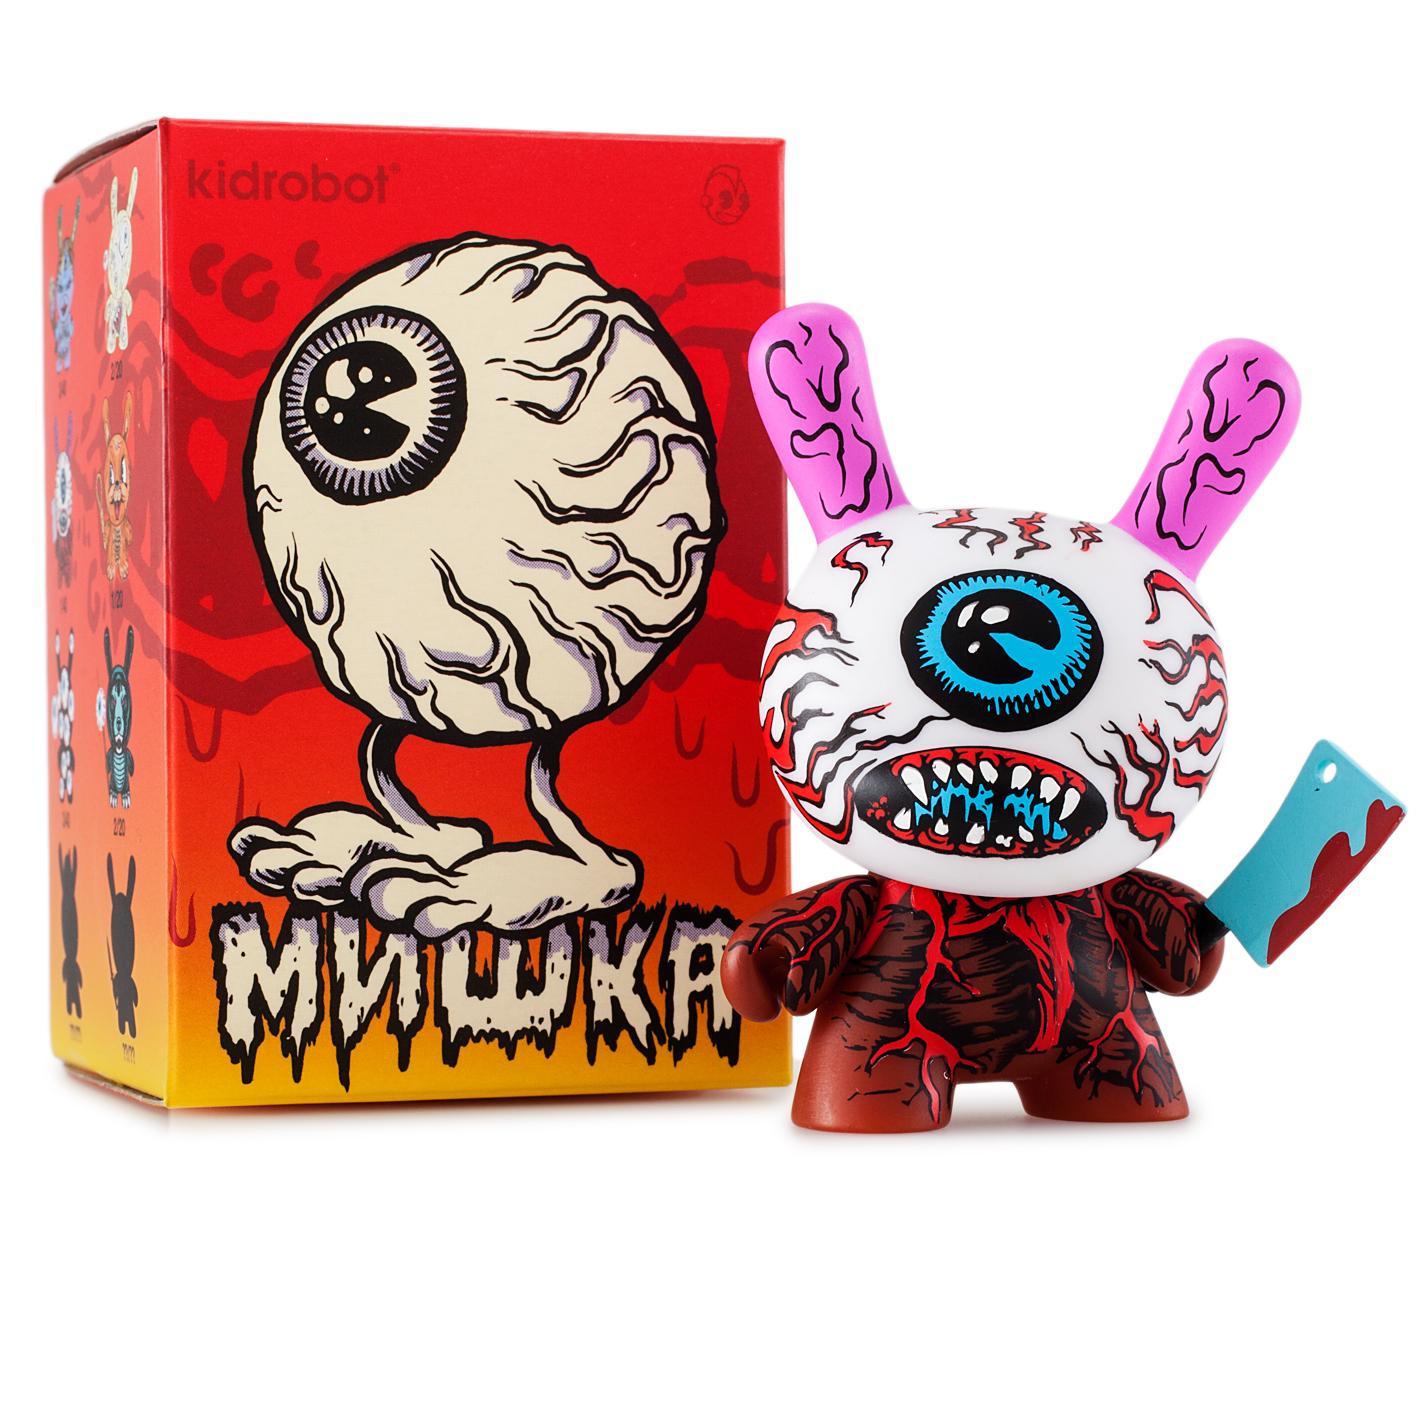 Mishka x Kidrobot Dunny Series